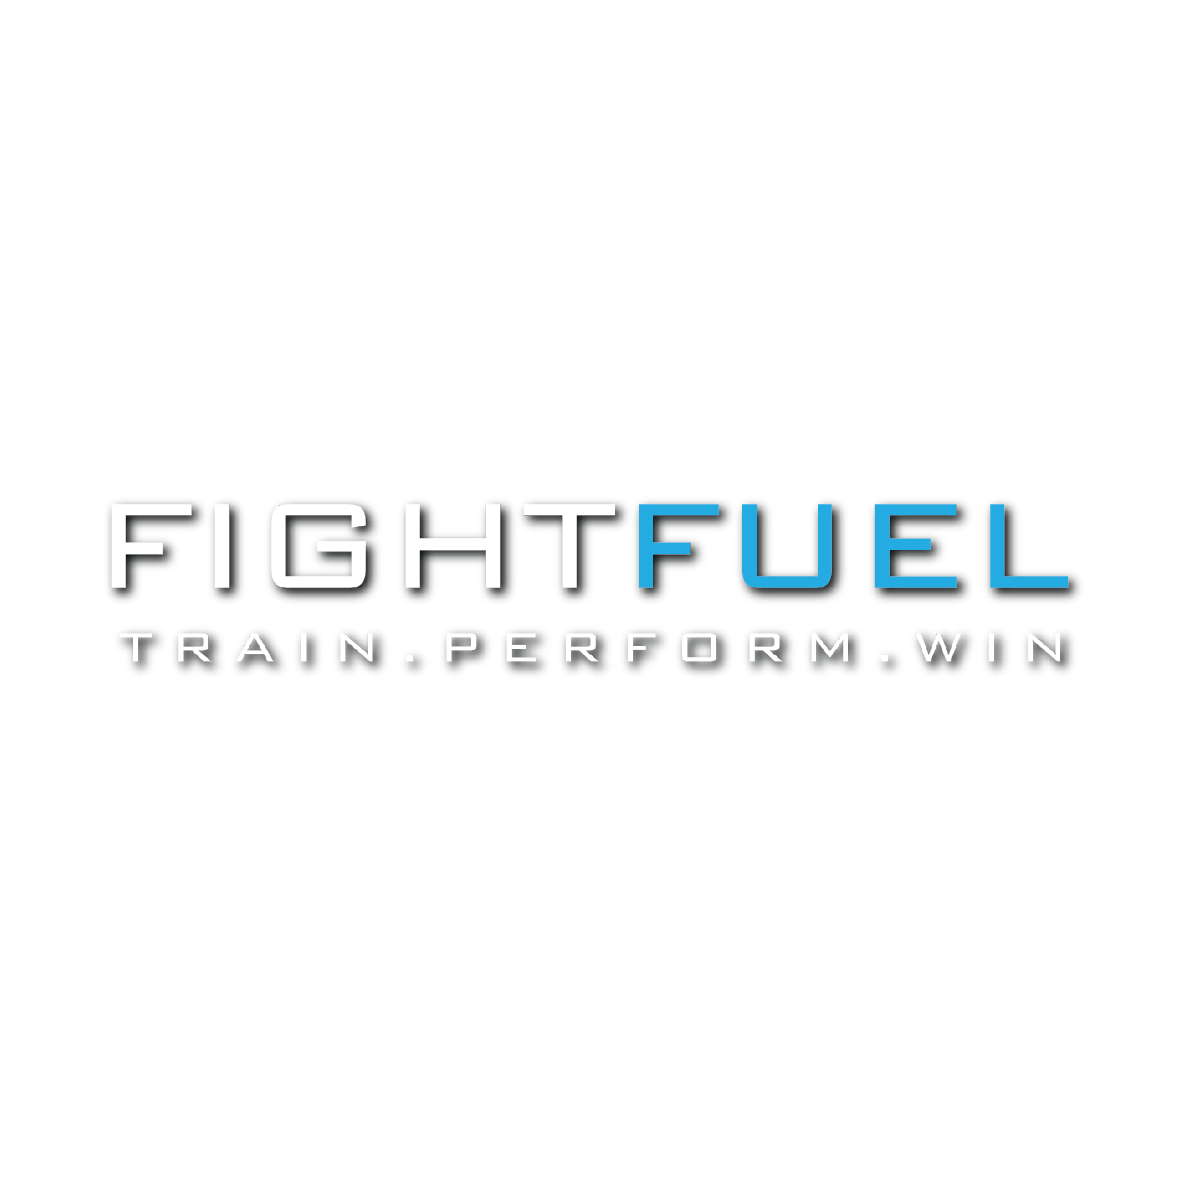 FIGHT FUEL